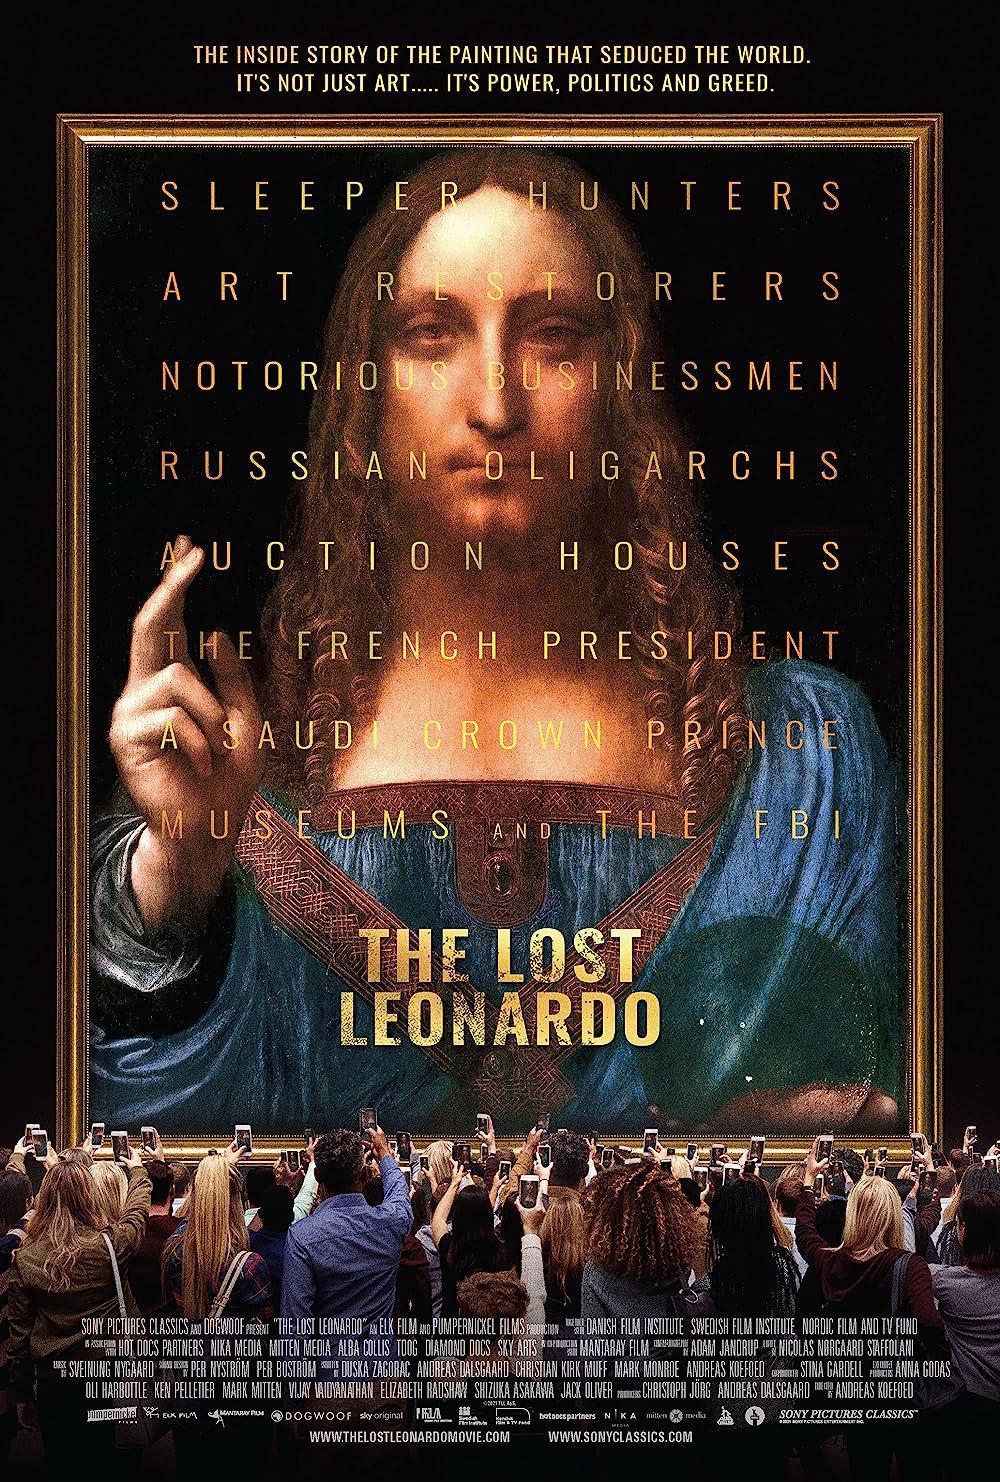 Download Filme The Lost Leonardo Qualidade Hd